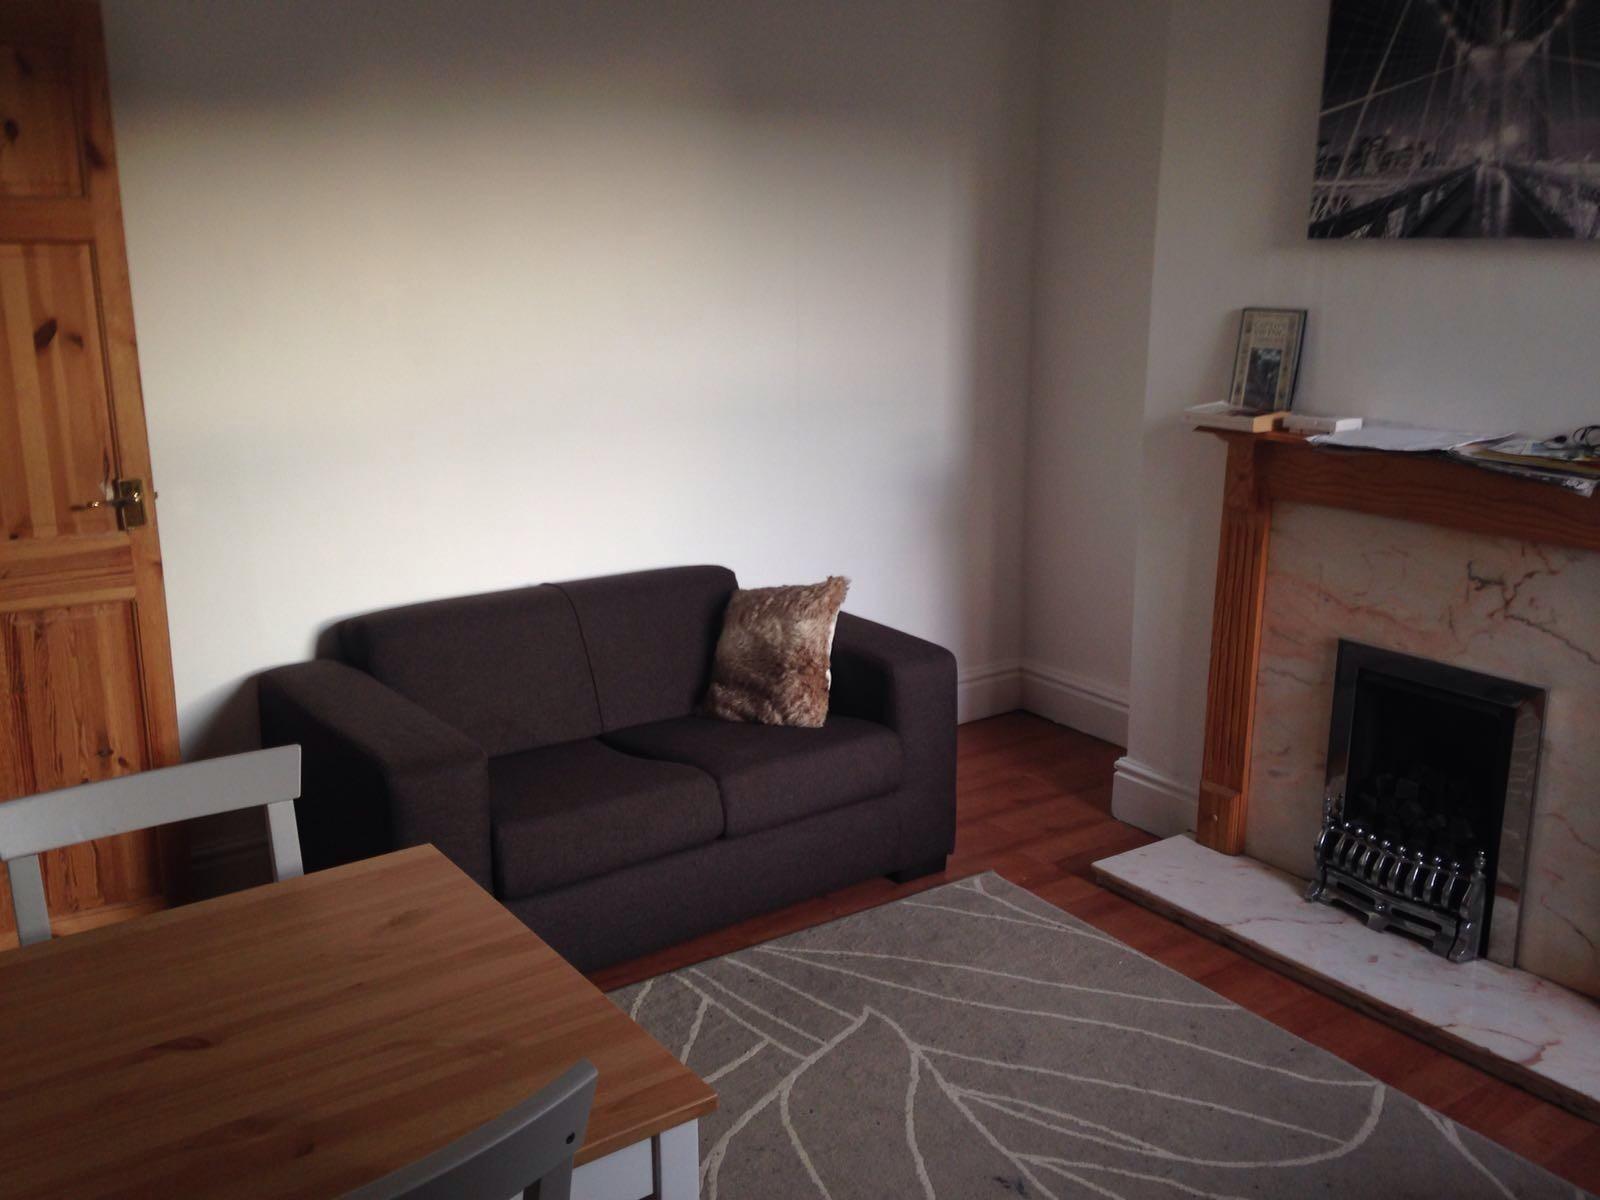 room-newly-refurbished-house-55pw-f674b1